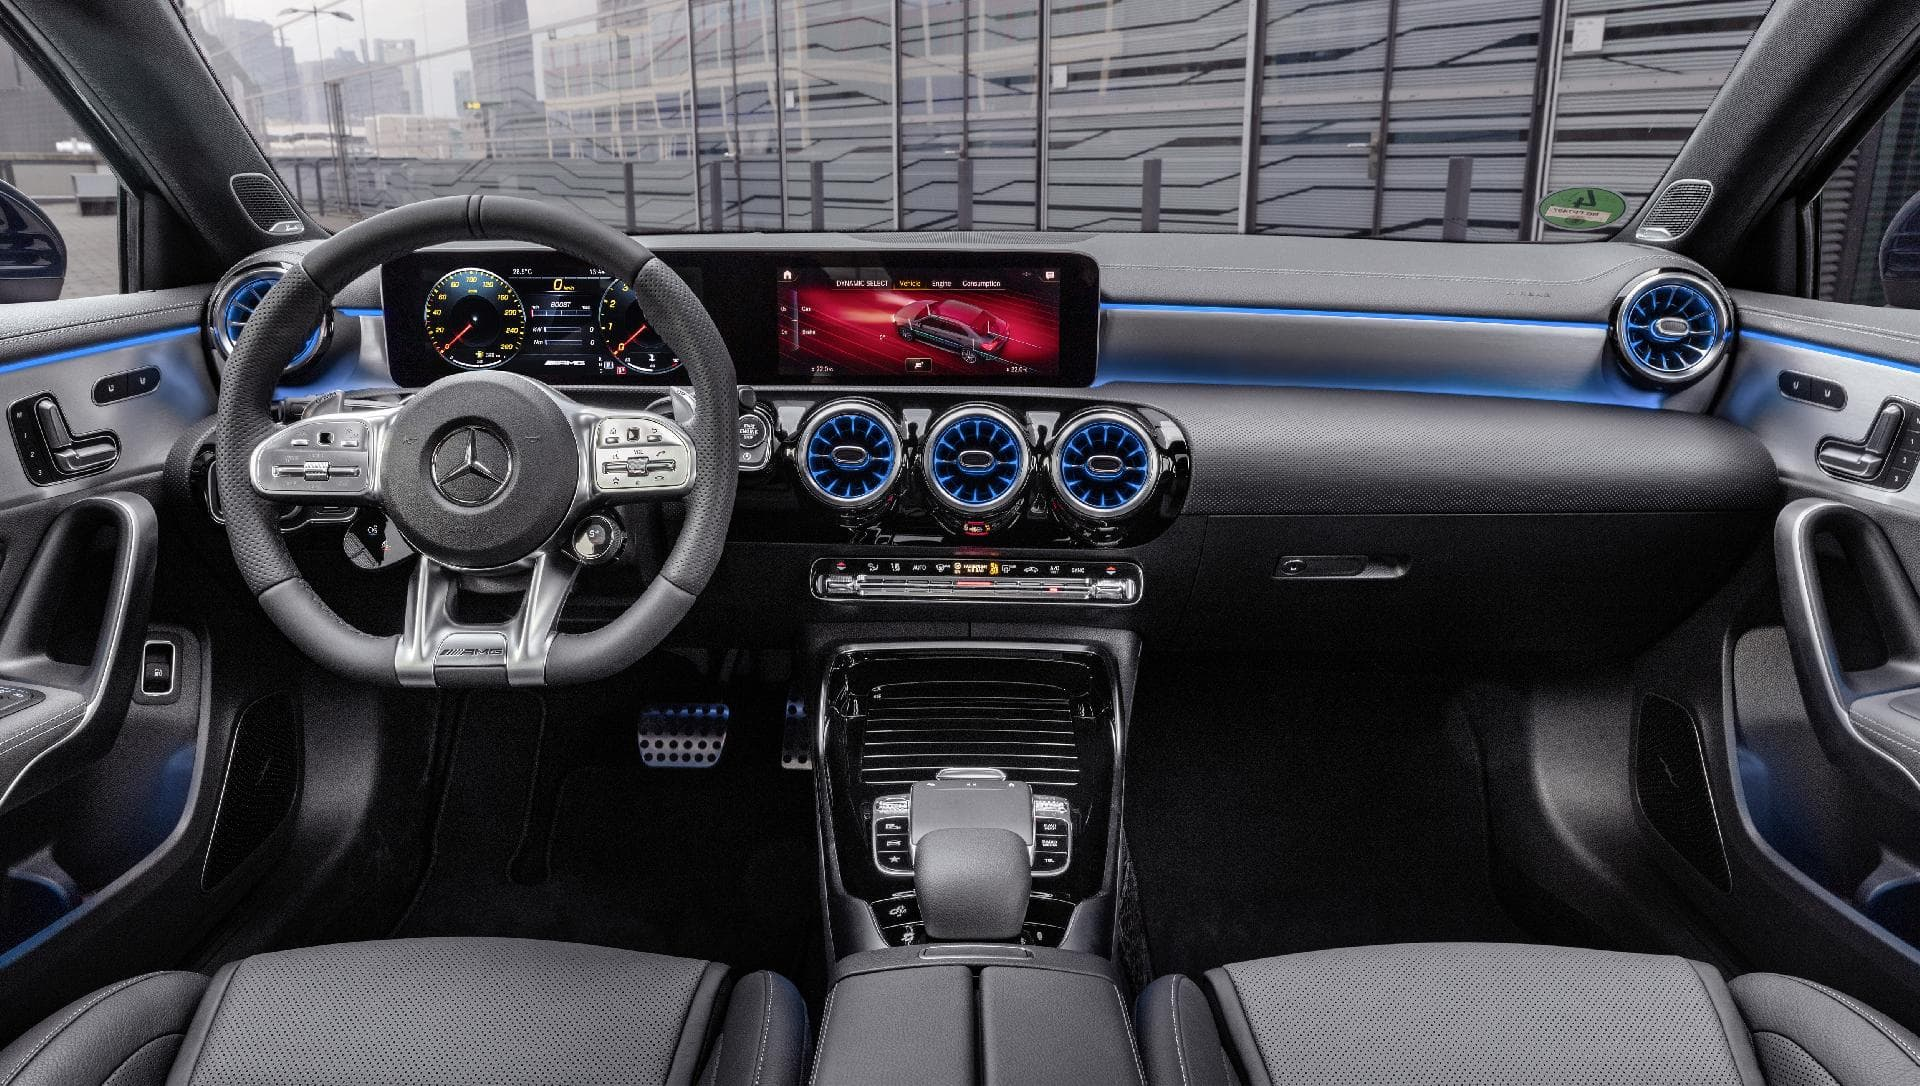 Mercedes Amg A35 Sedan 19c0171 069